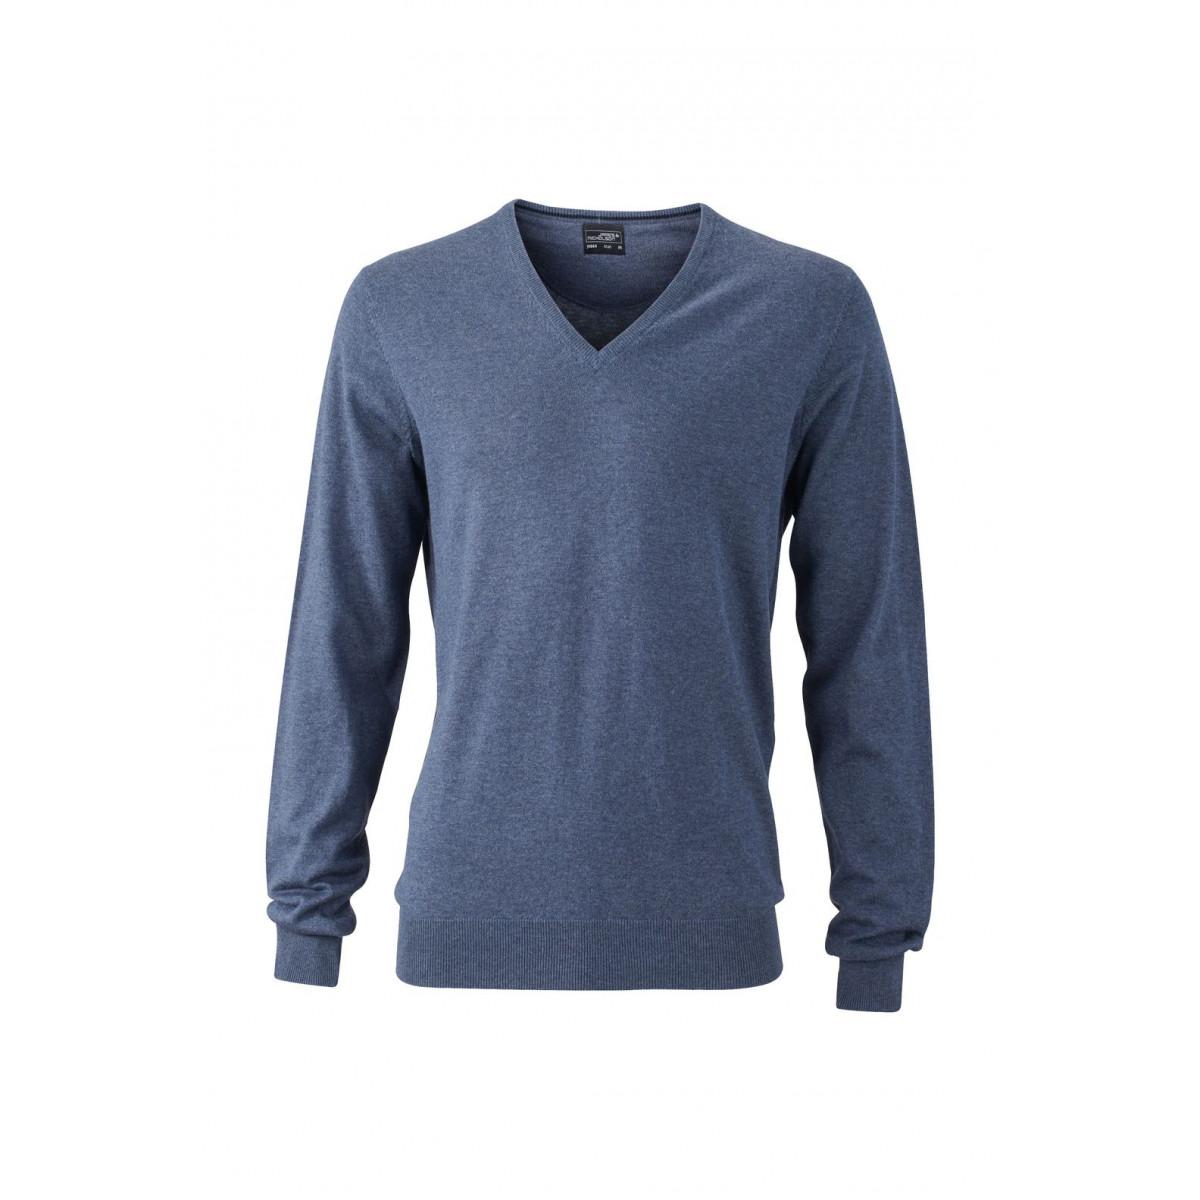 Пуловер мужской JN664 Mens Pullover - Джинс меланж